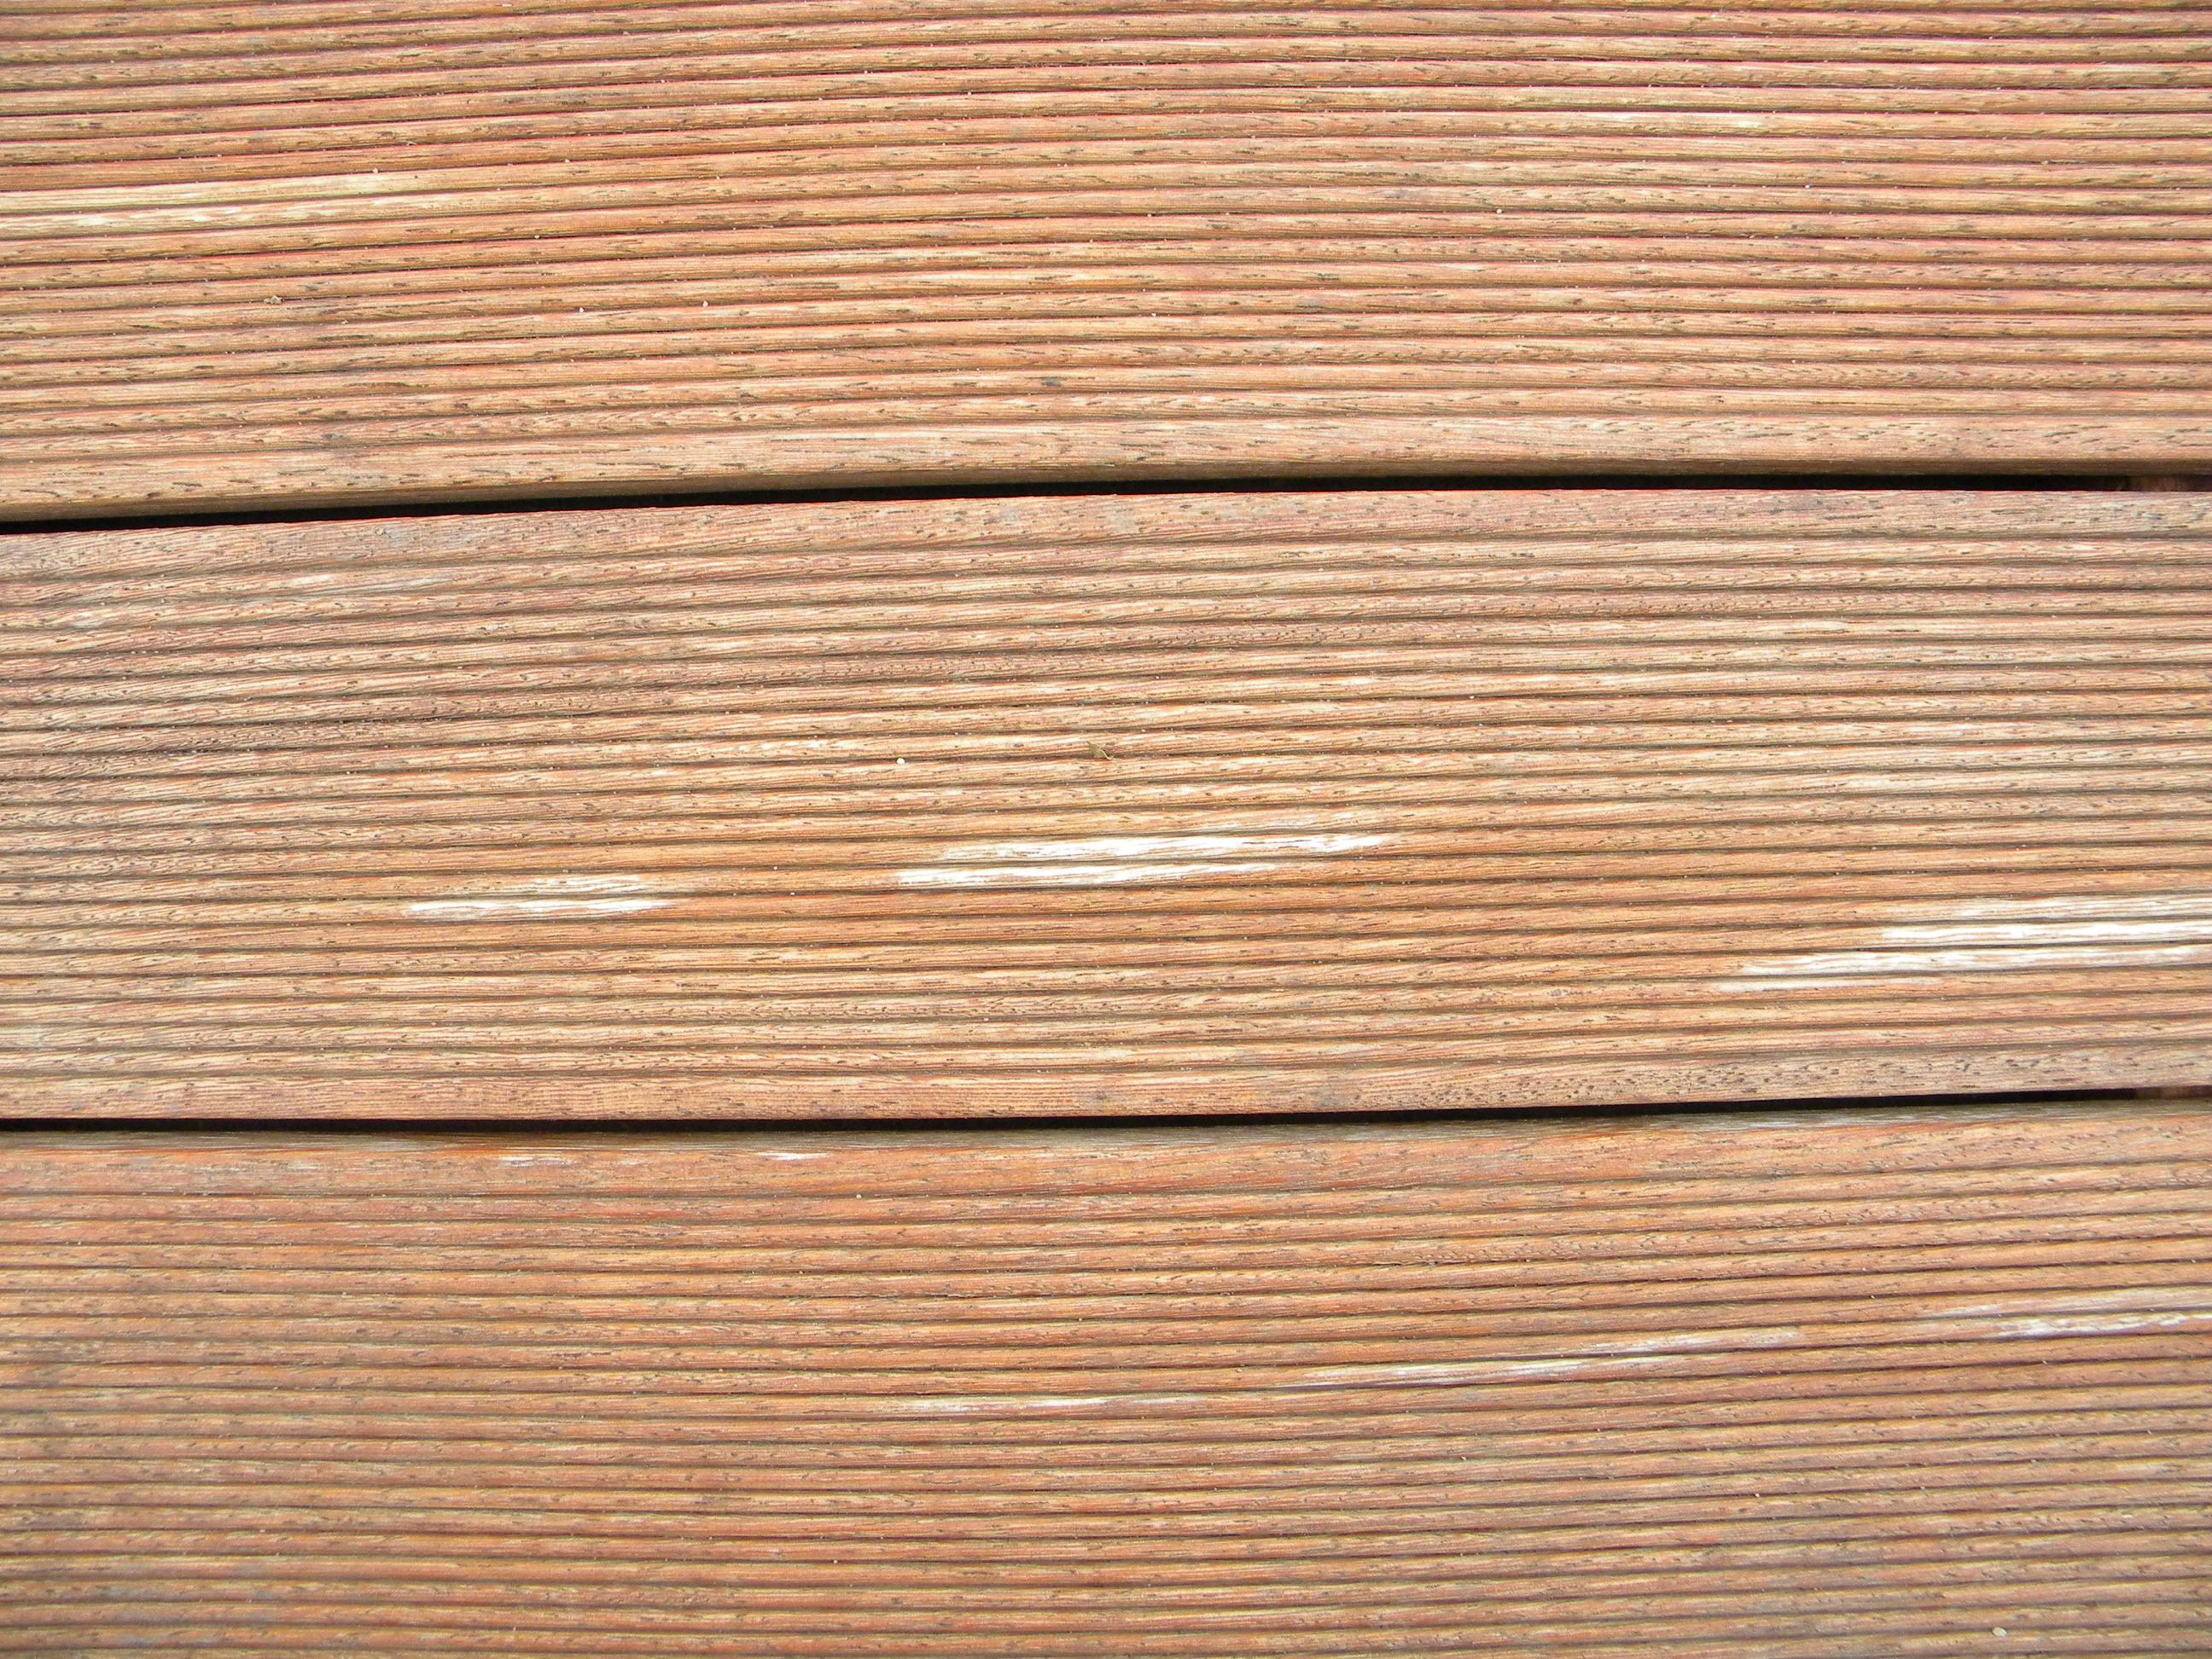 Deck-uri lemn - Angelim Pedra SELVA FLOORS - Poza 66